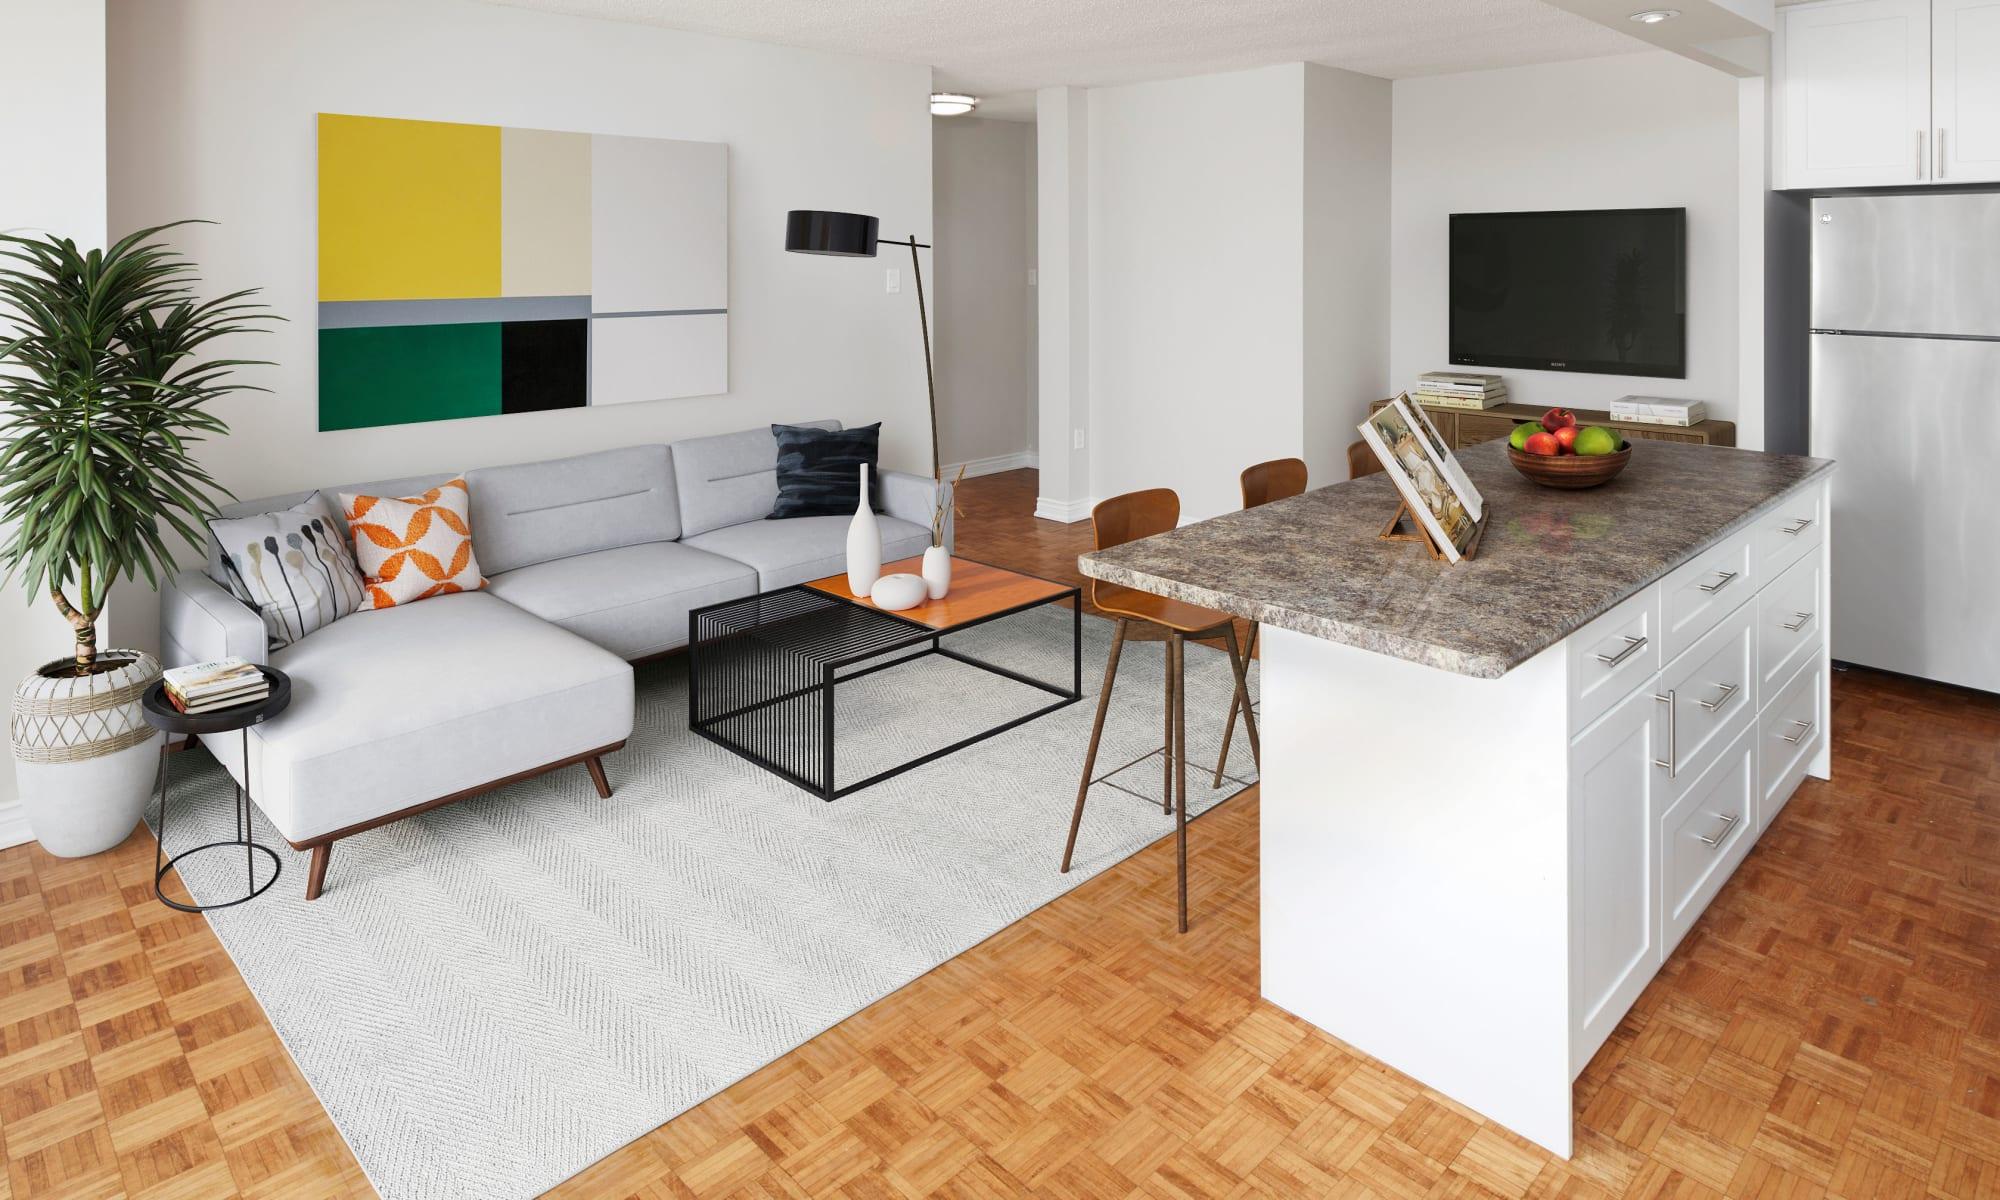 Apartments in Mississauga, Ontario